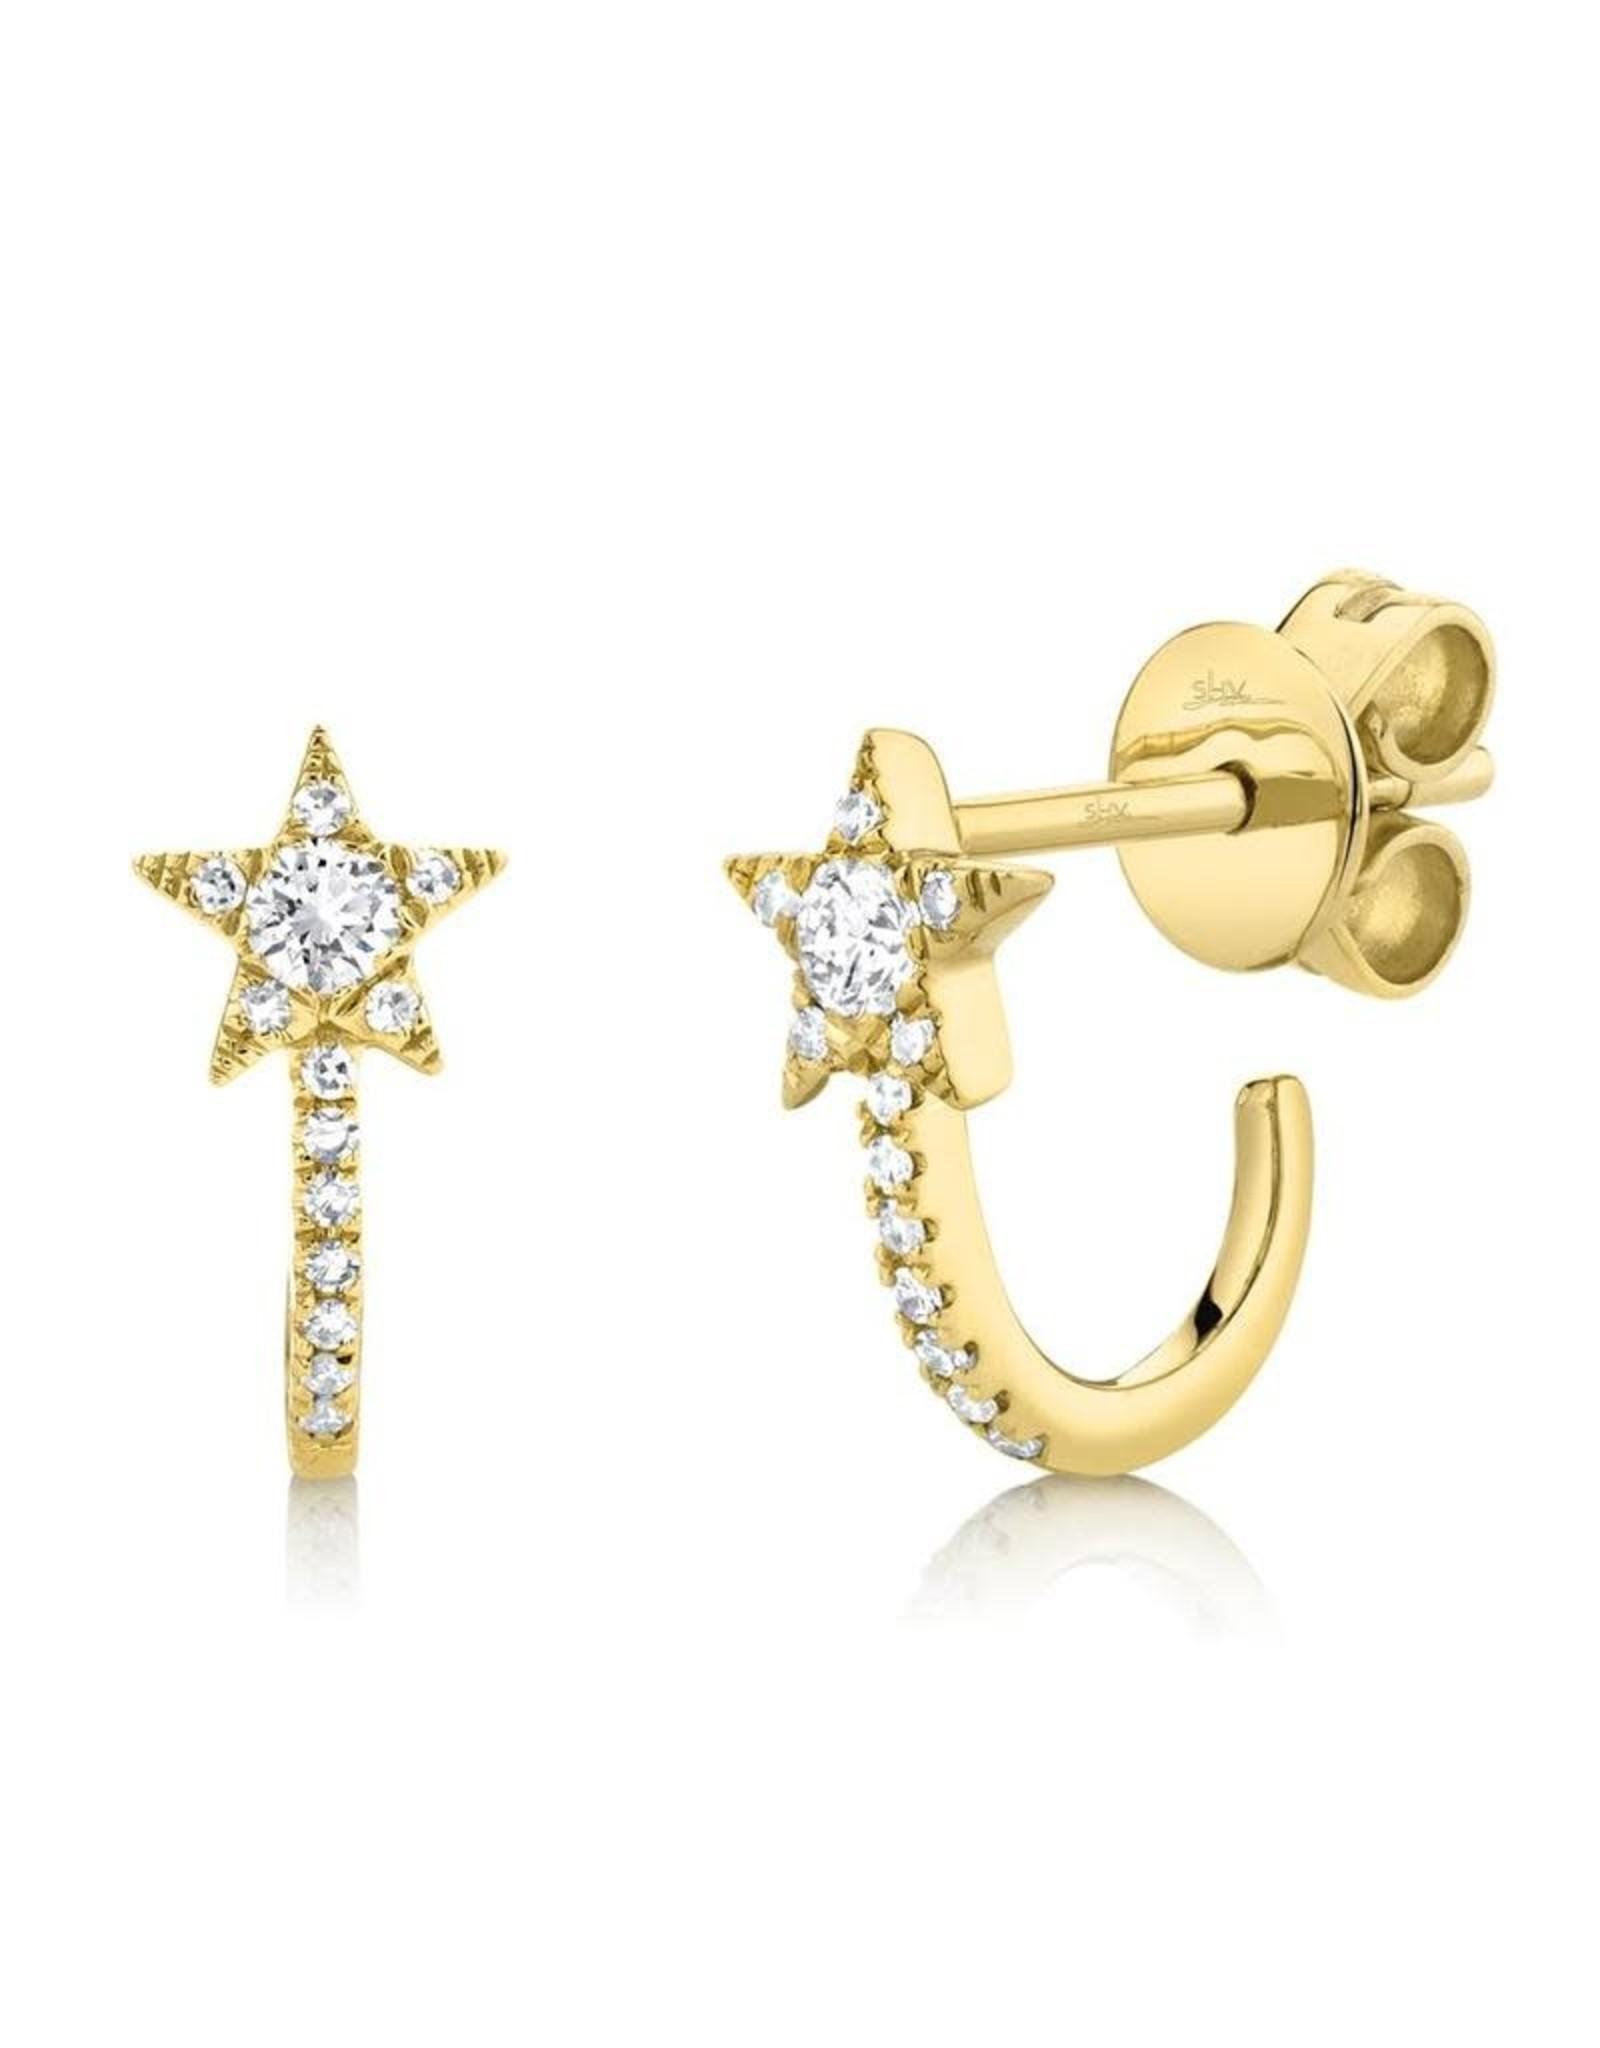 14K Yellow Gold Diamond Star Half Huggie Earrings, D: 0.17ct